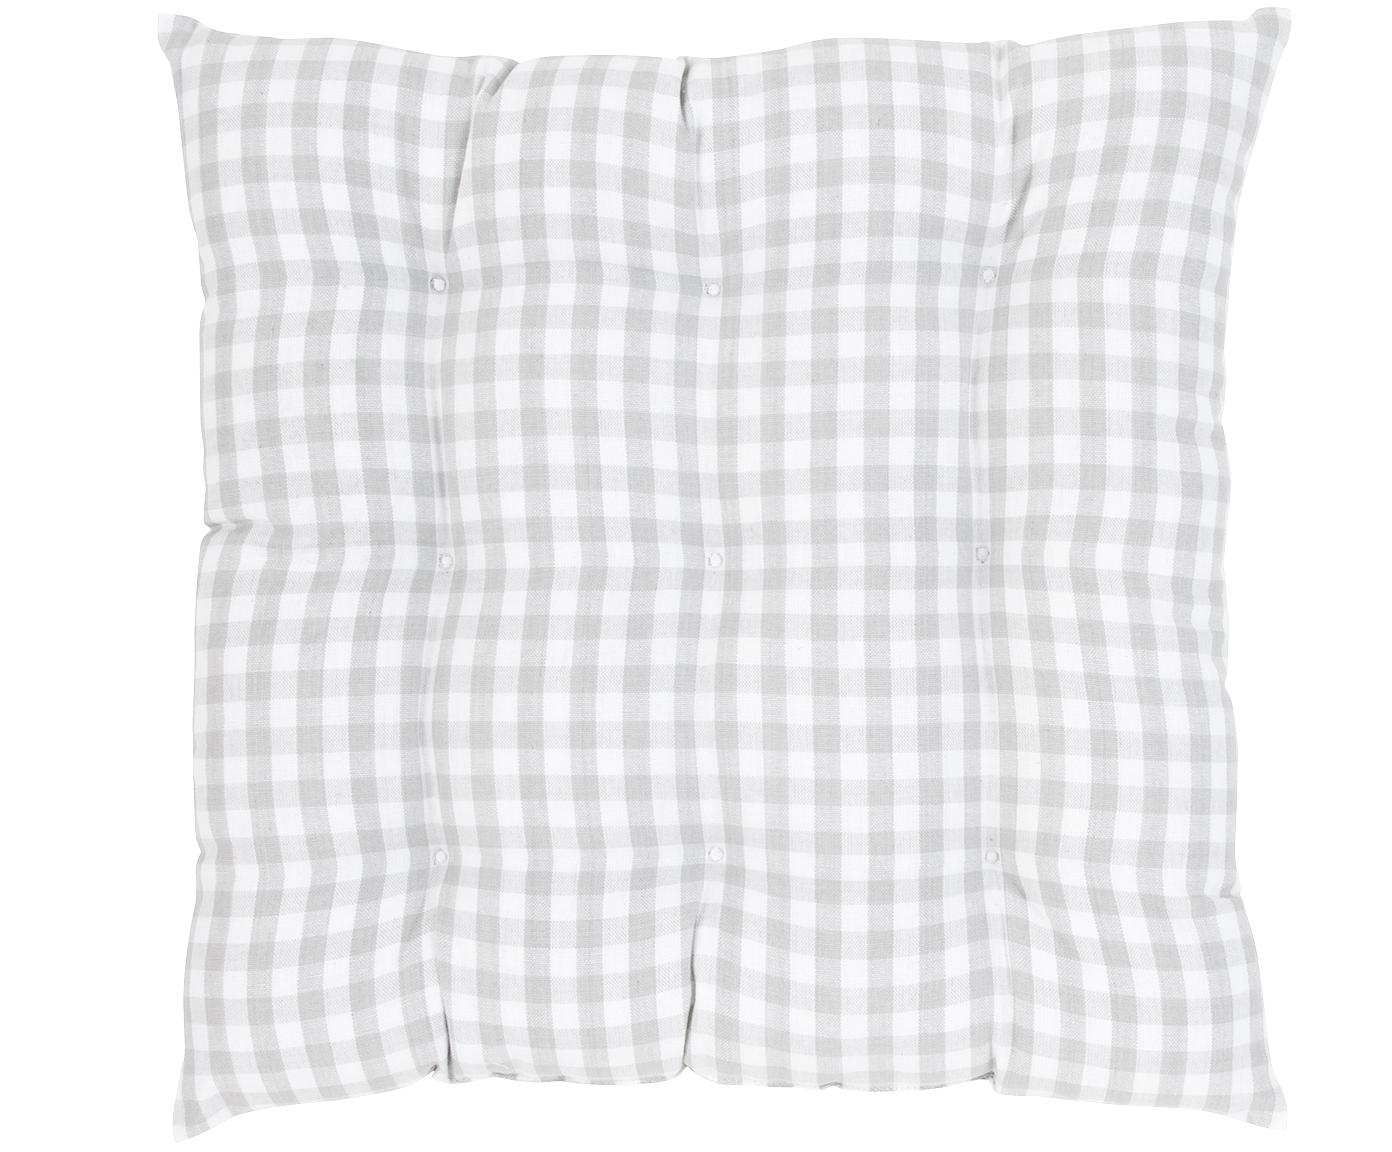 Cojín de asiento Karolin, Gris claro, crema, An 40 x L 40 cm